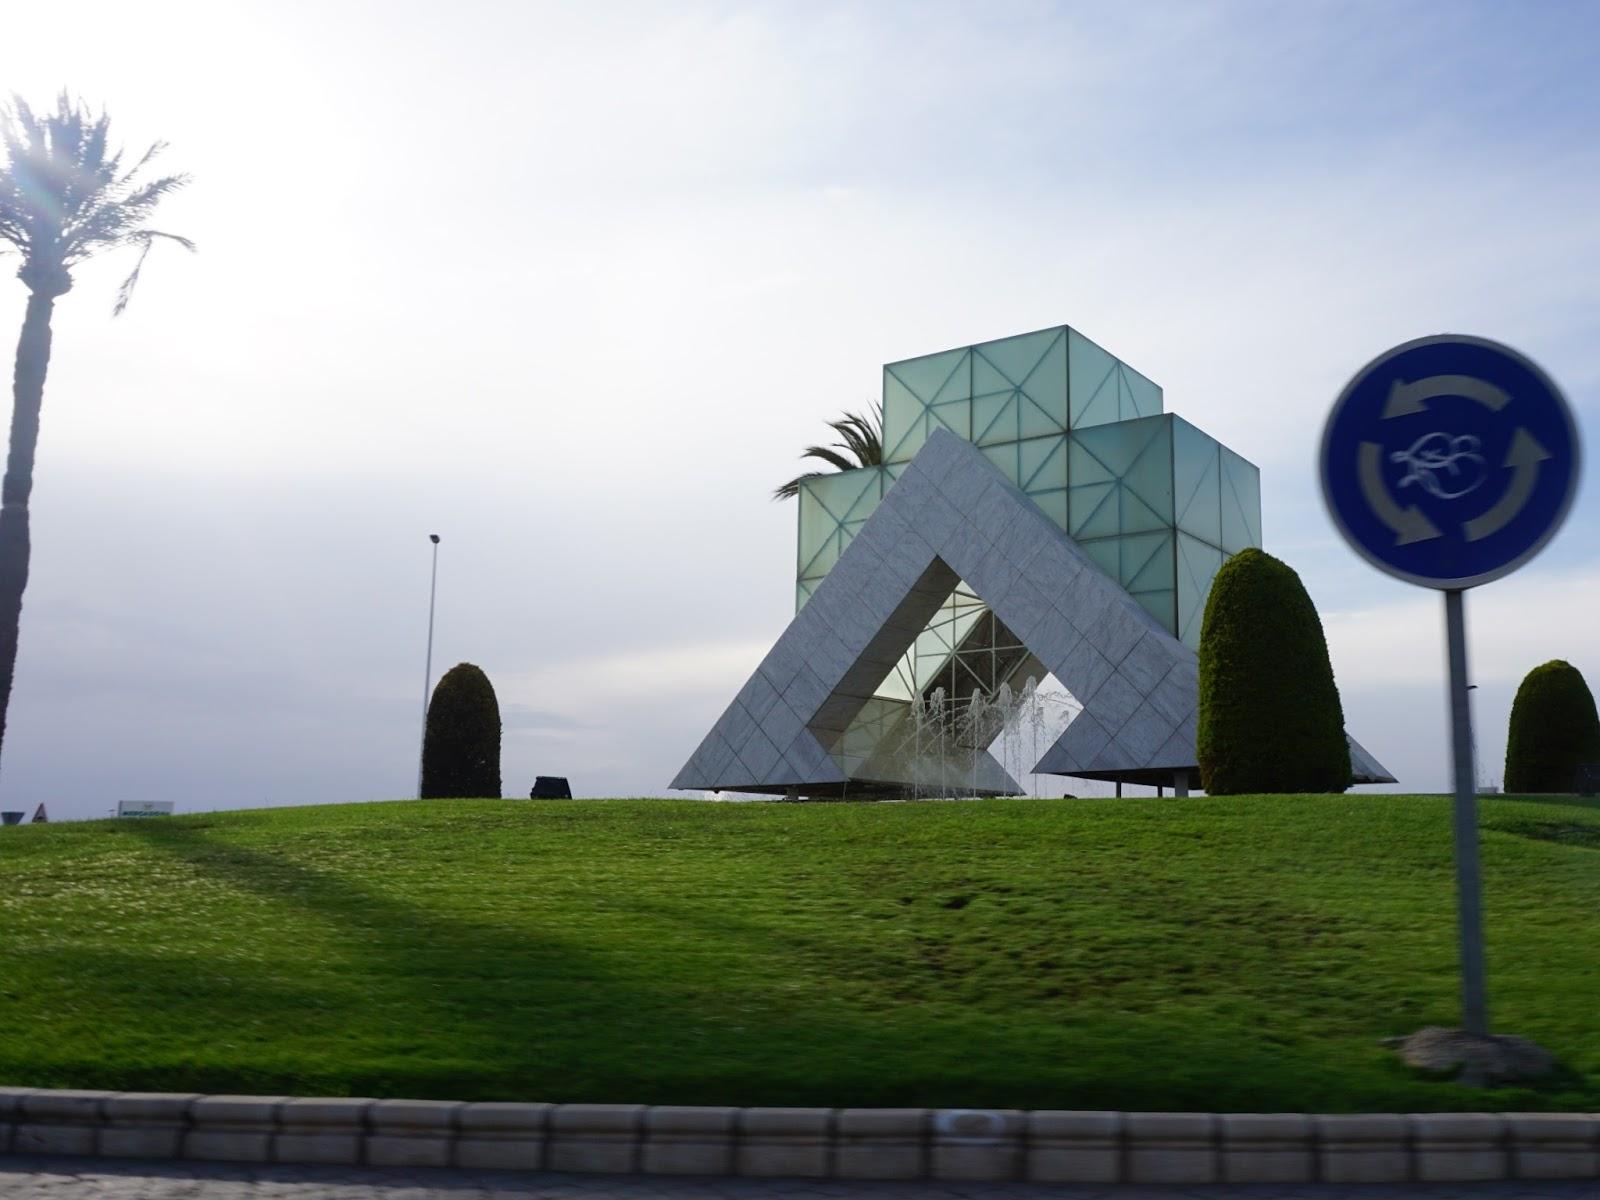 hiszpańskie miasto, Torrevieja, panidorcia, blog, Hiszpania, podróże, hiszpańskie rondo